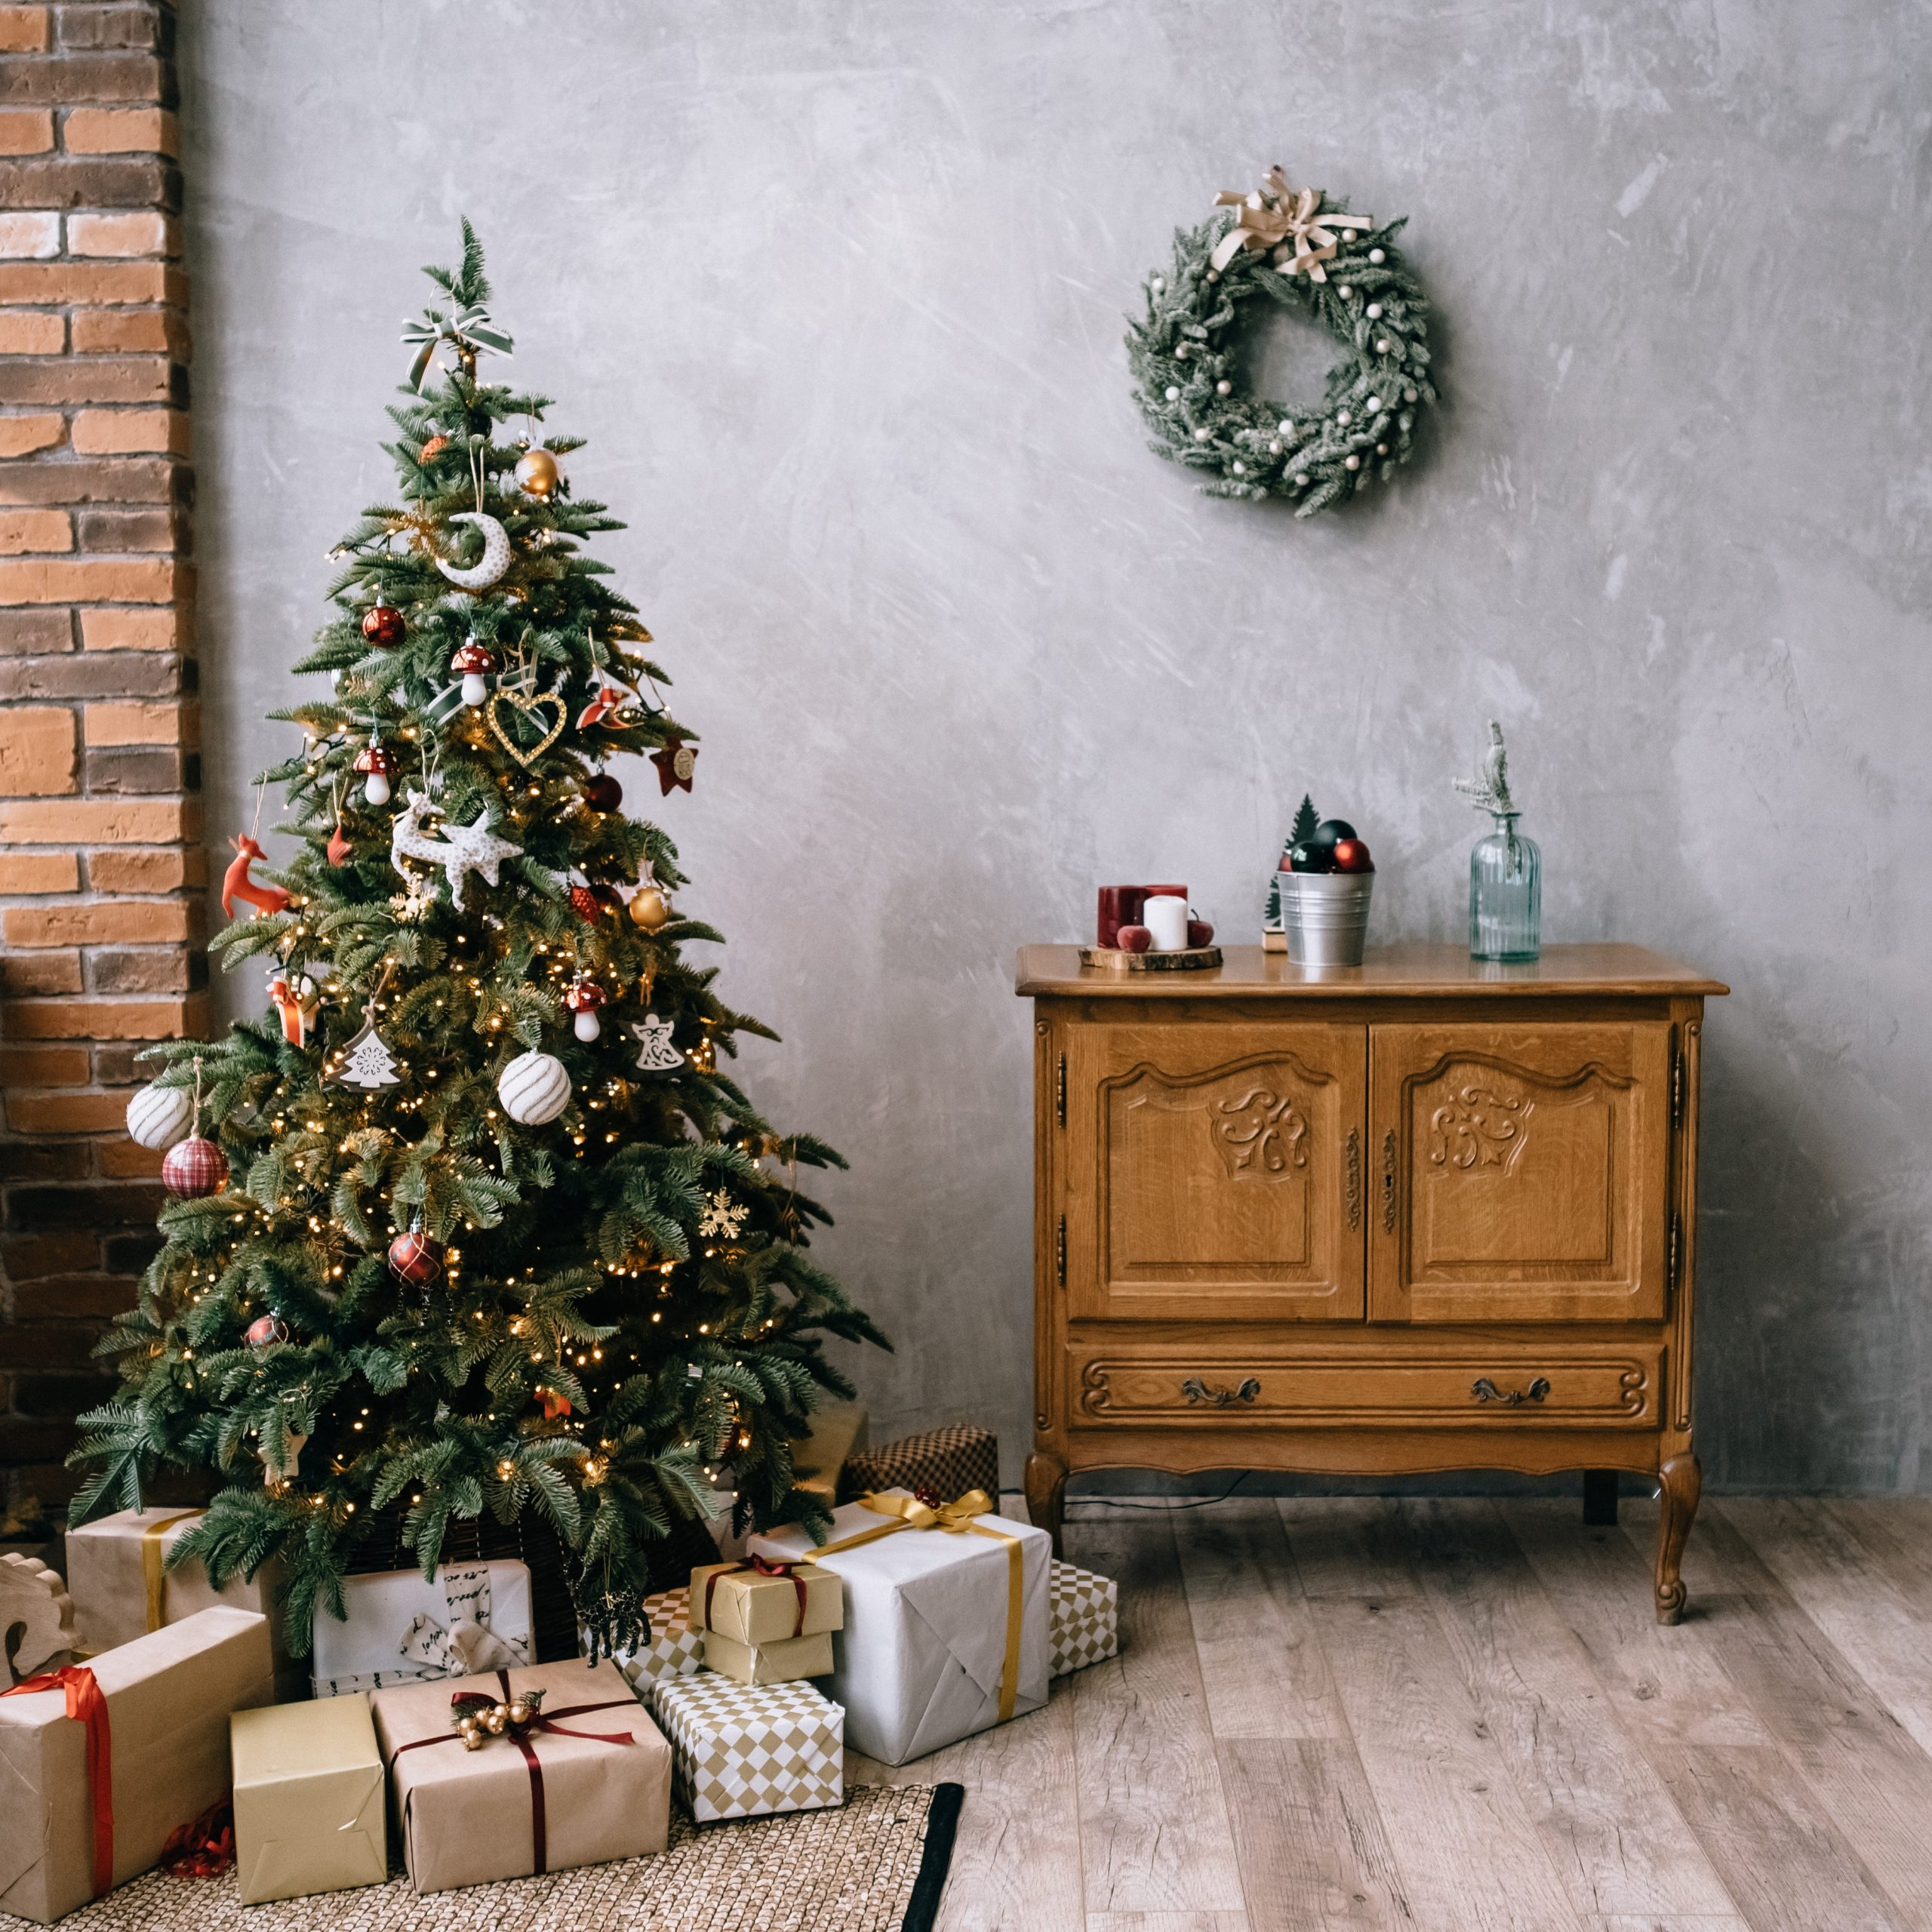 christimas-tree-decoration-pexels-oleg-zaicev-4834891